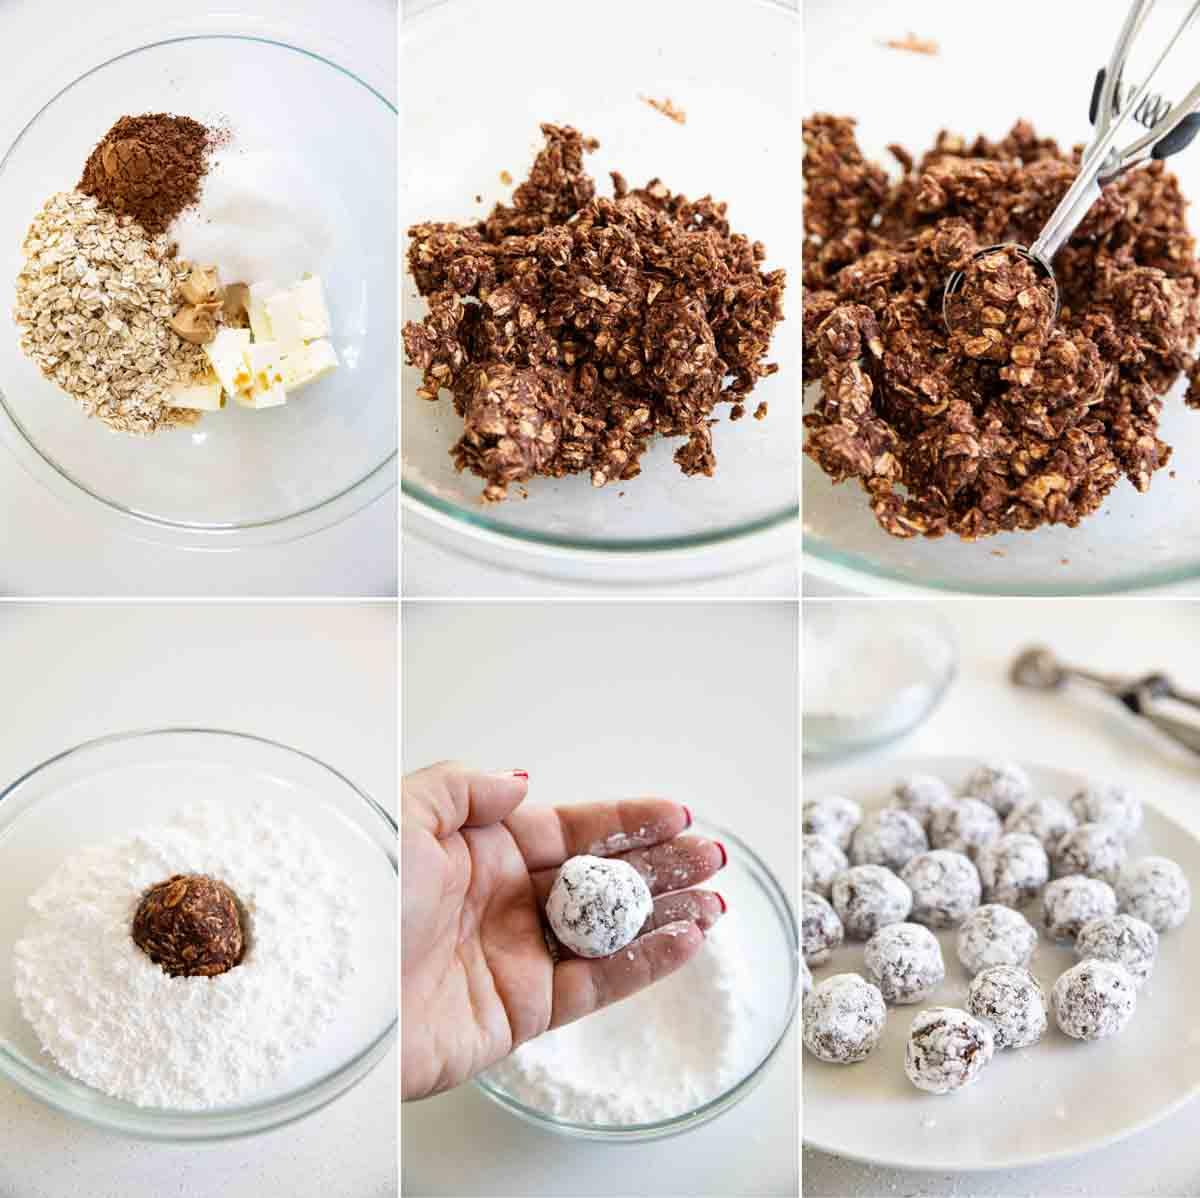 steps to make oatmeal balls